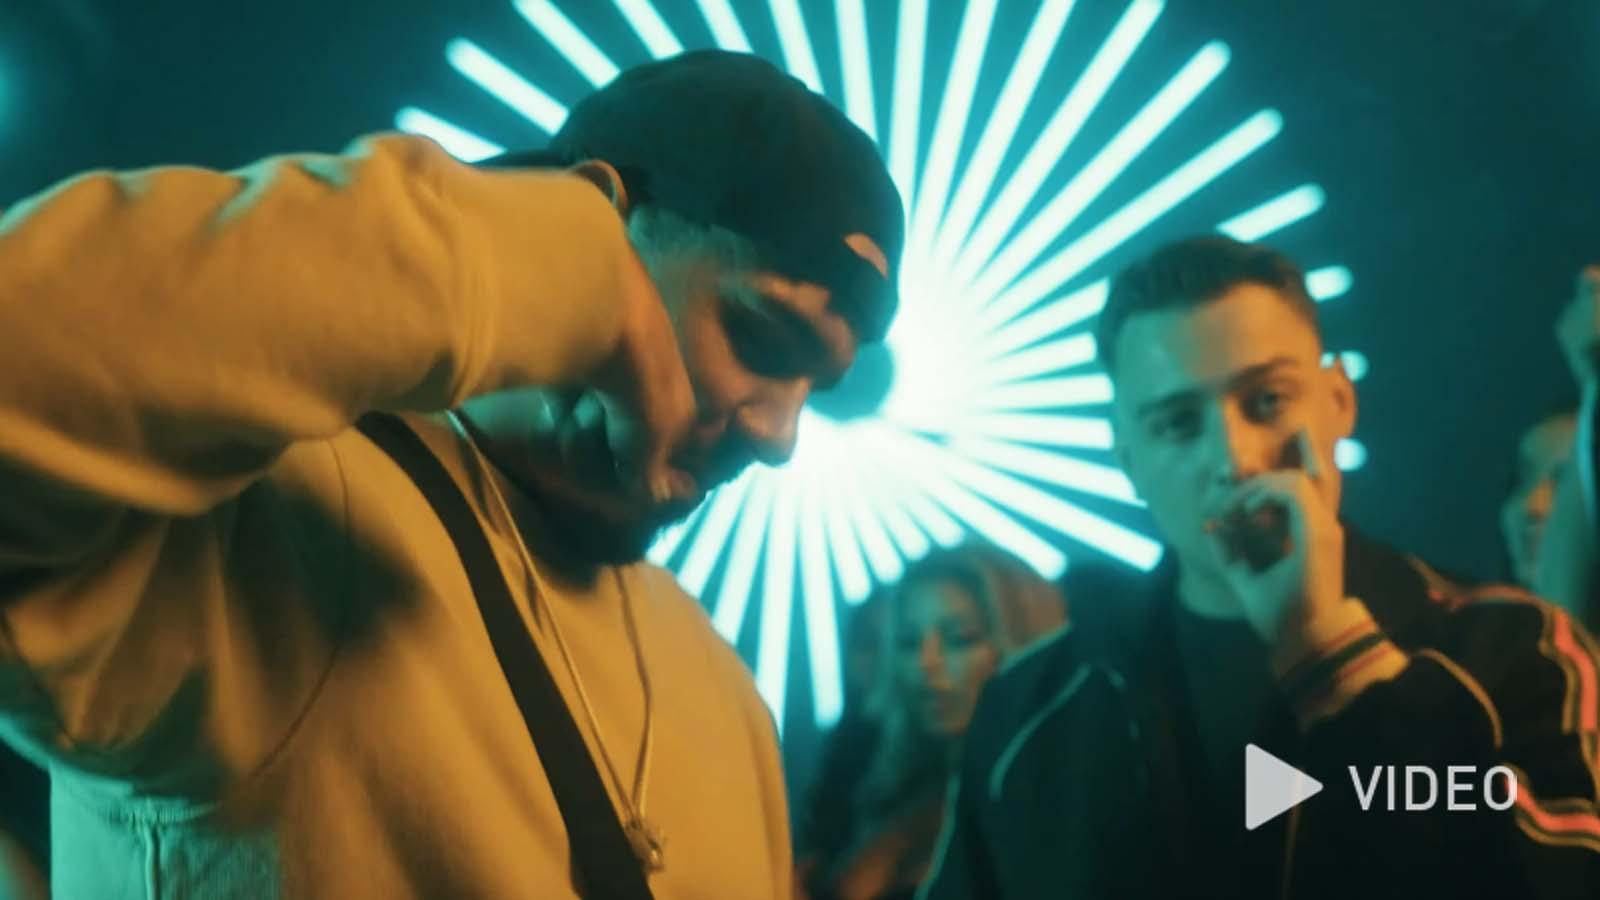 NGEE ft. Capital Bra – Gib ihr Flex [Video]